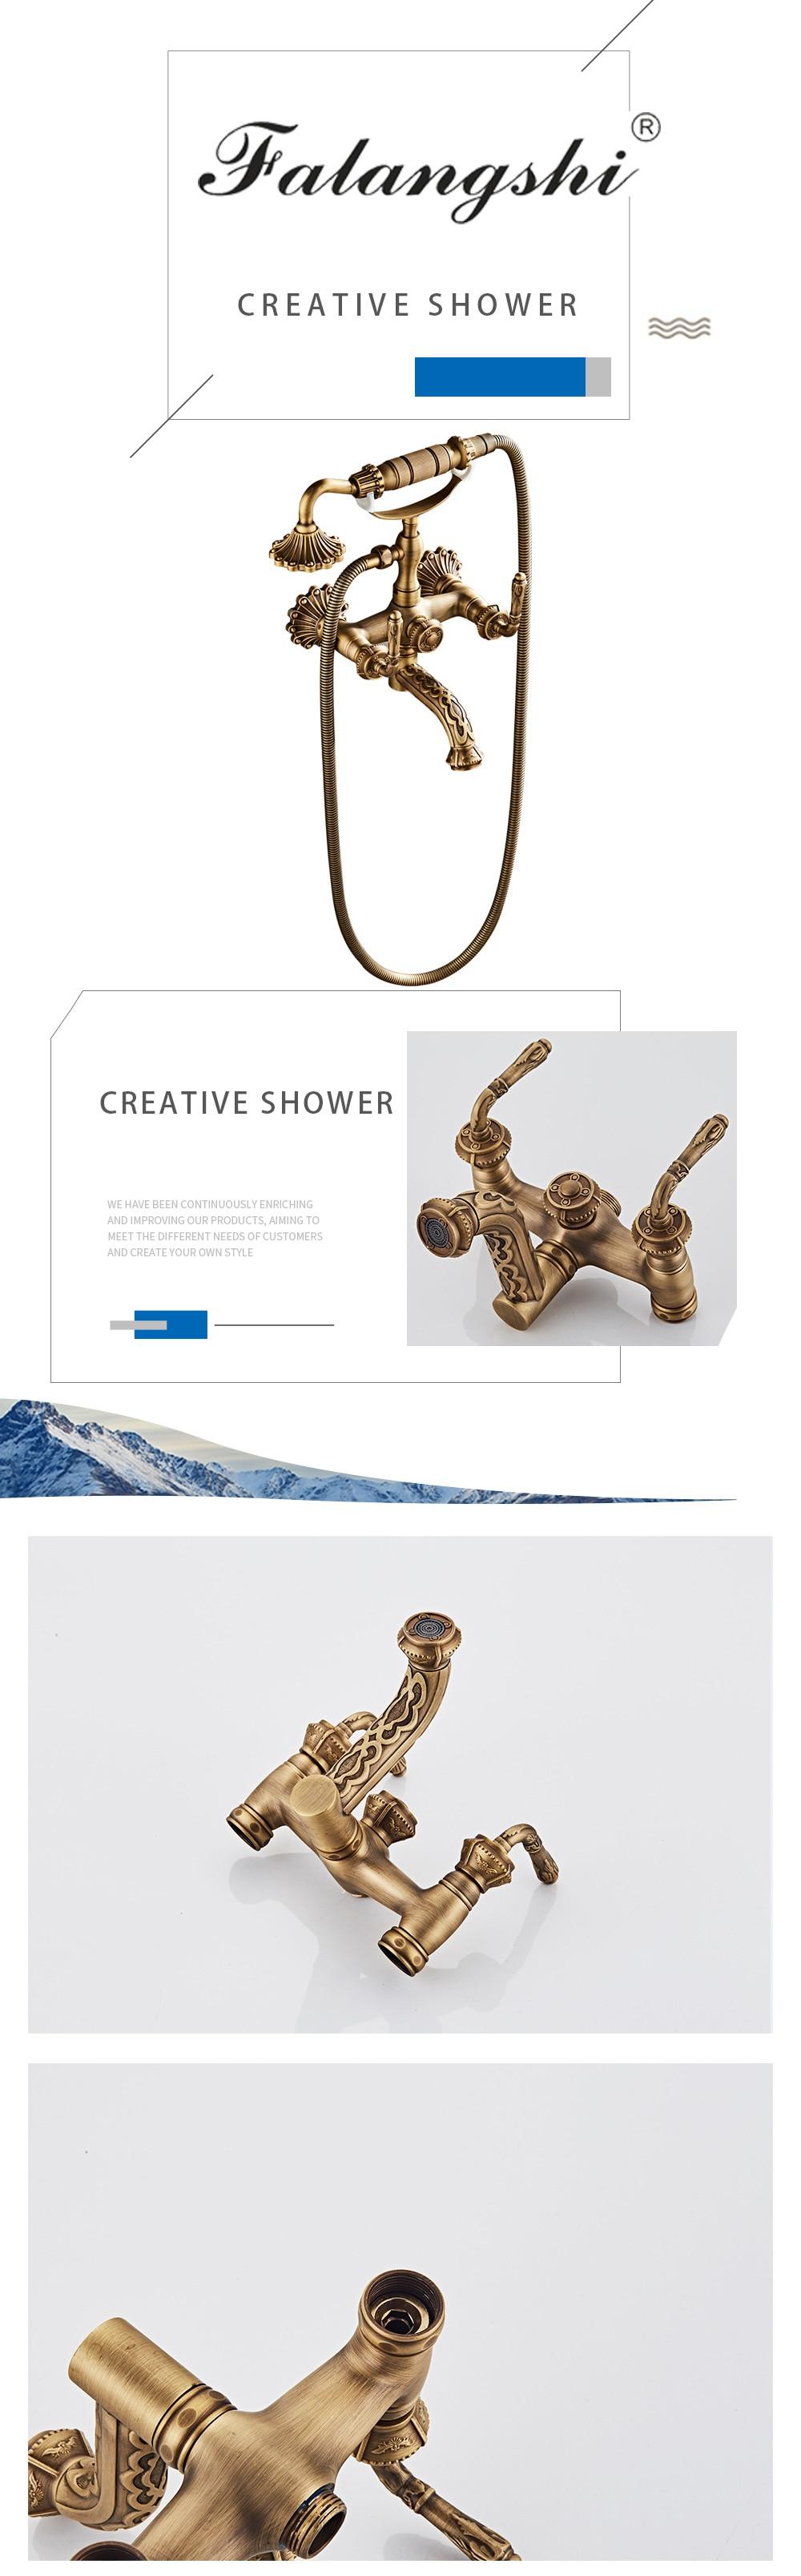 H62a6ea5669c9482f92b11e810e158114e Antique Bronze Bathroom Shower Faucet High Quantity Bathtub Shower Set Mixer With Hand Shower Taps Wall Mounted WB1603